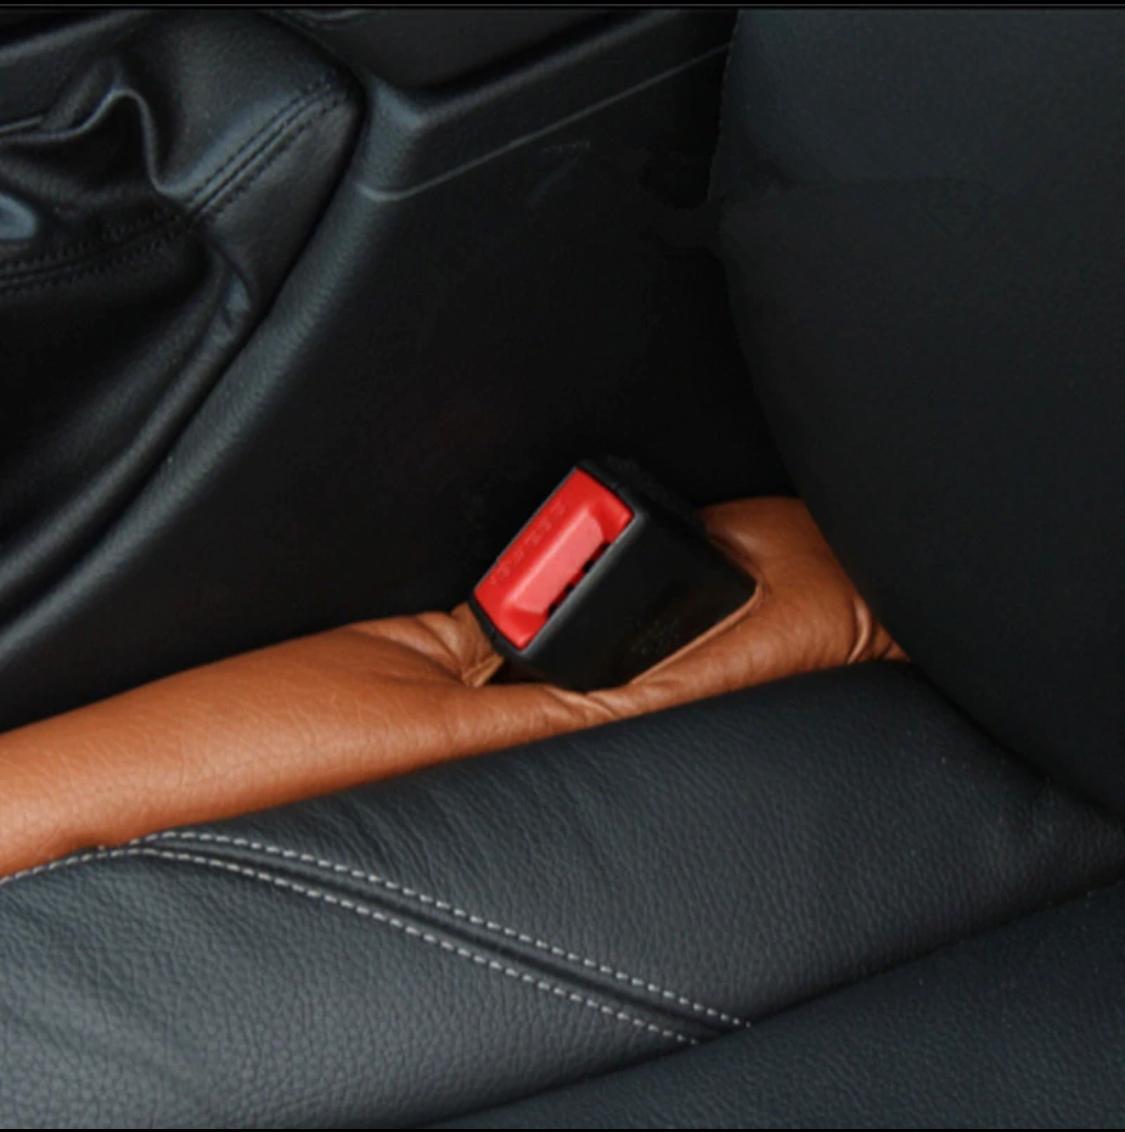 2 Pcs Car Seat Gap Pad Leak Proof Plate Plug Seat Leak Cover